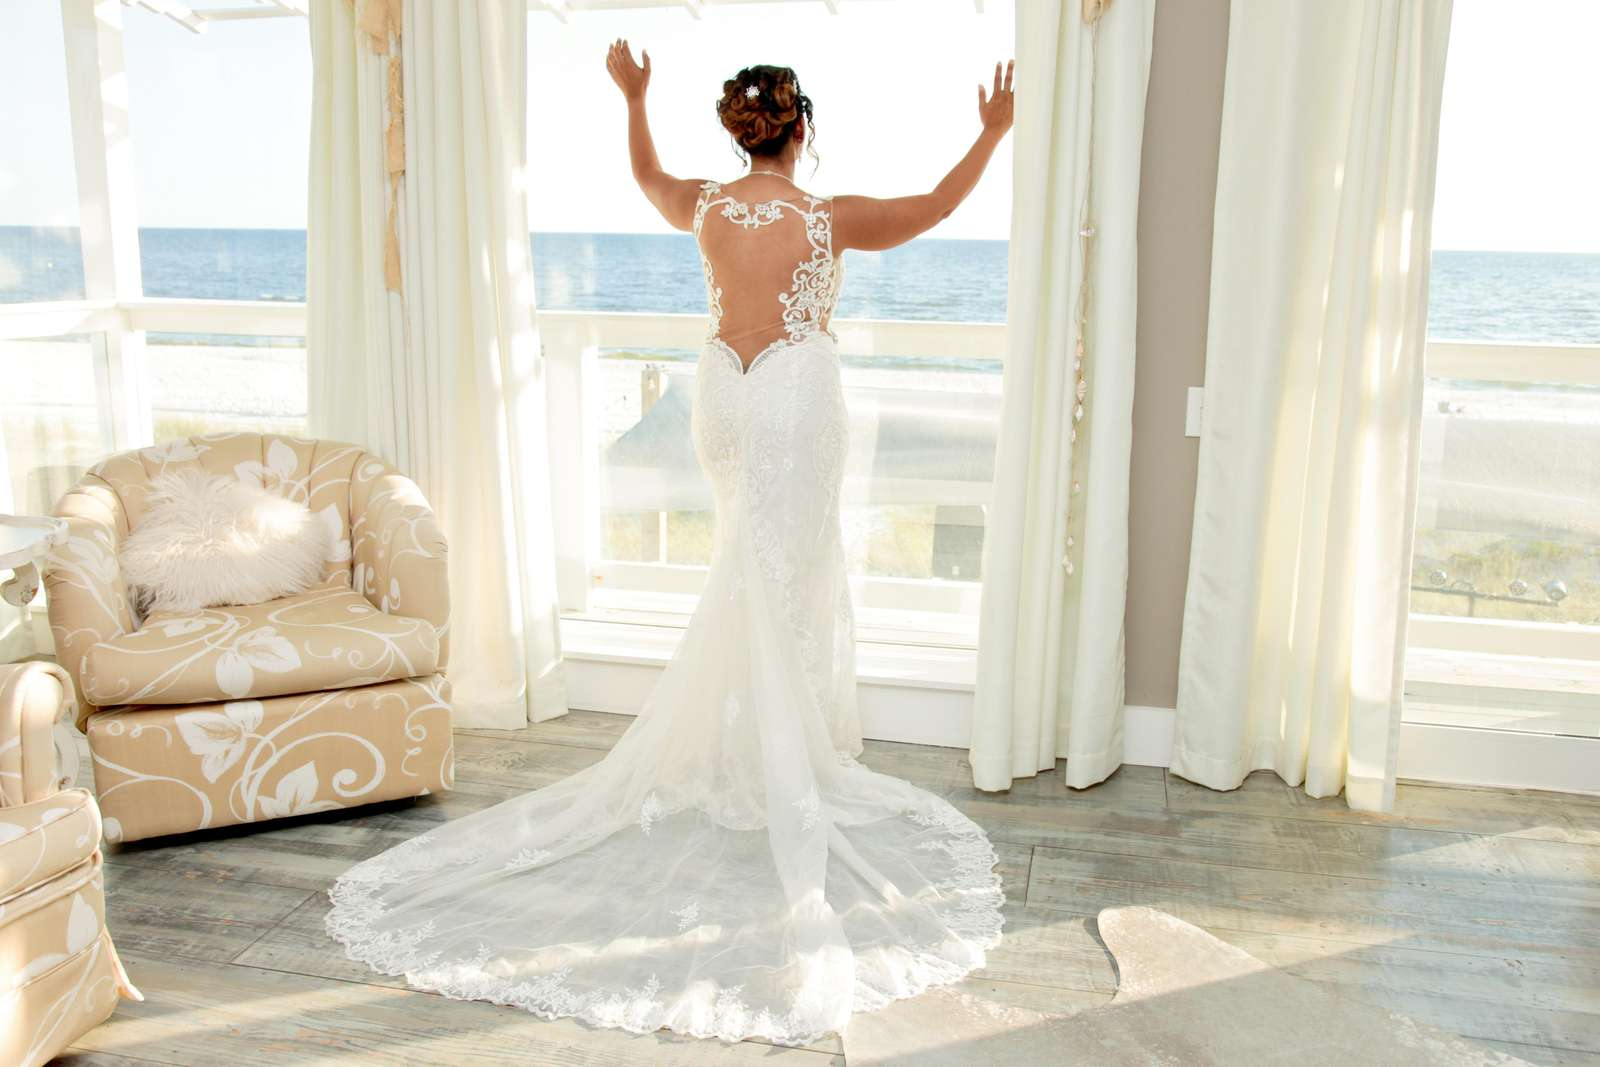 Corona Del Mar Gulf Front Home - Little Mermaid Properties